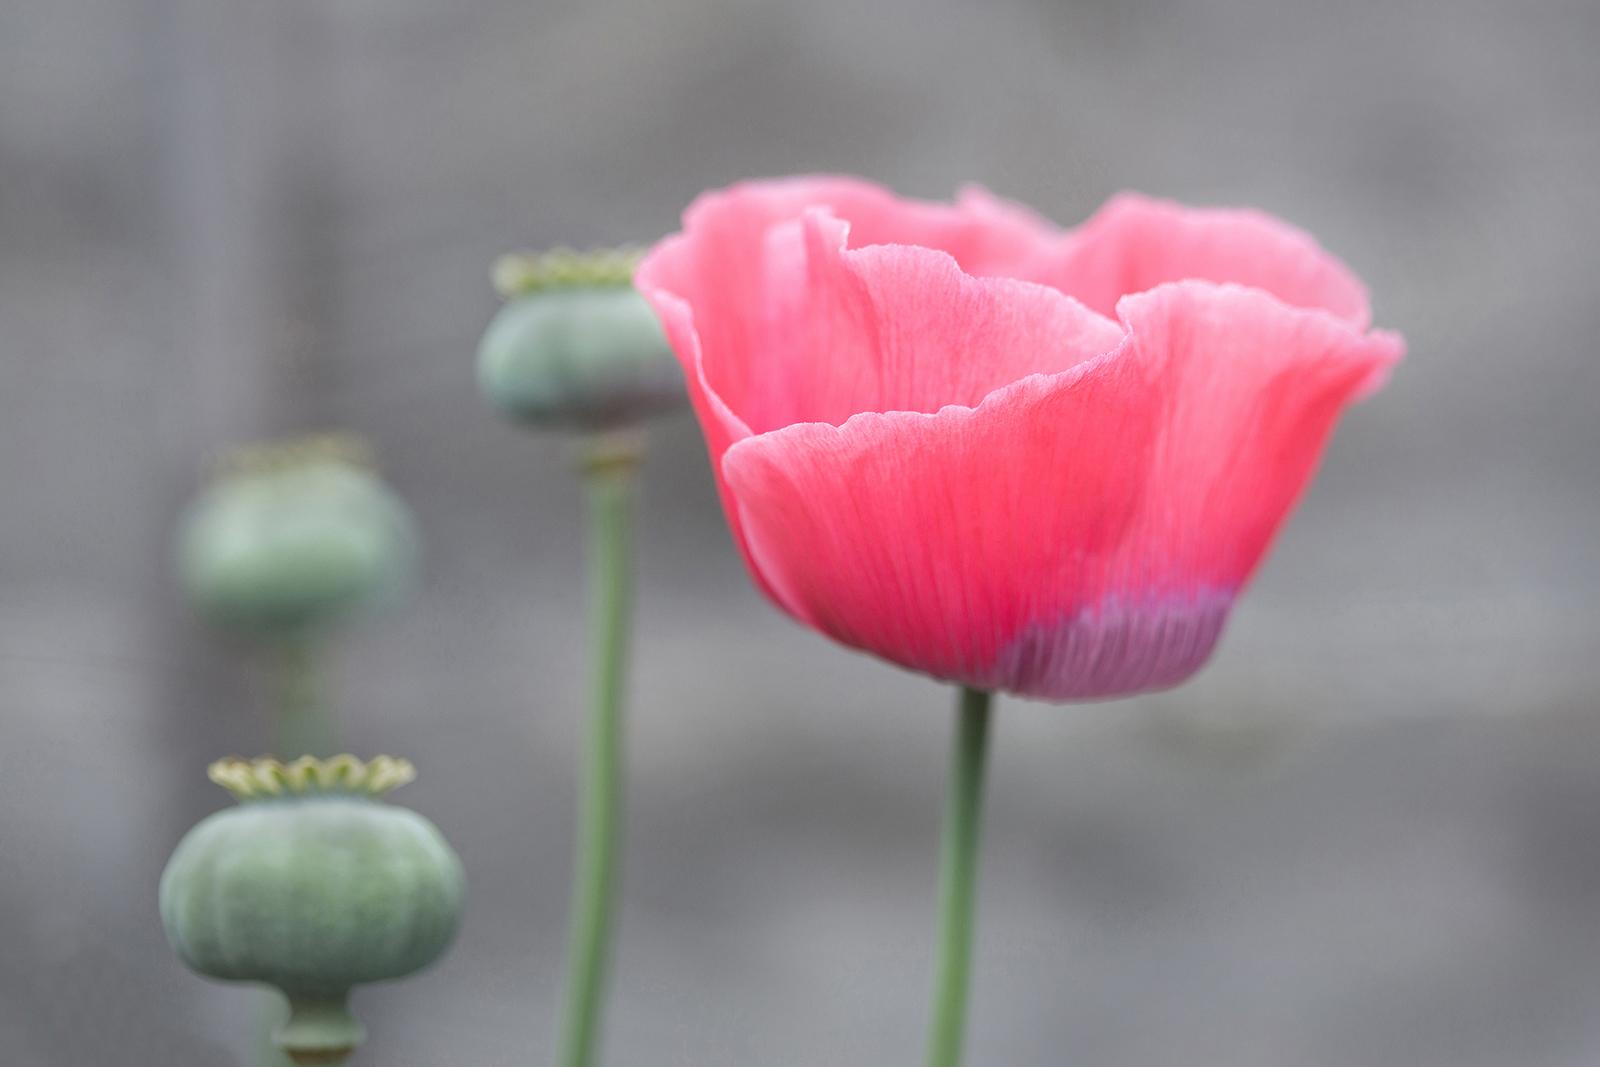 Second 'Last Poppy' by Sarah Shelley